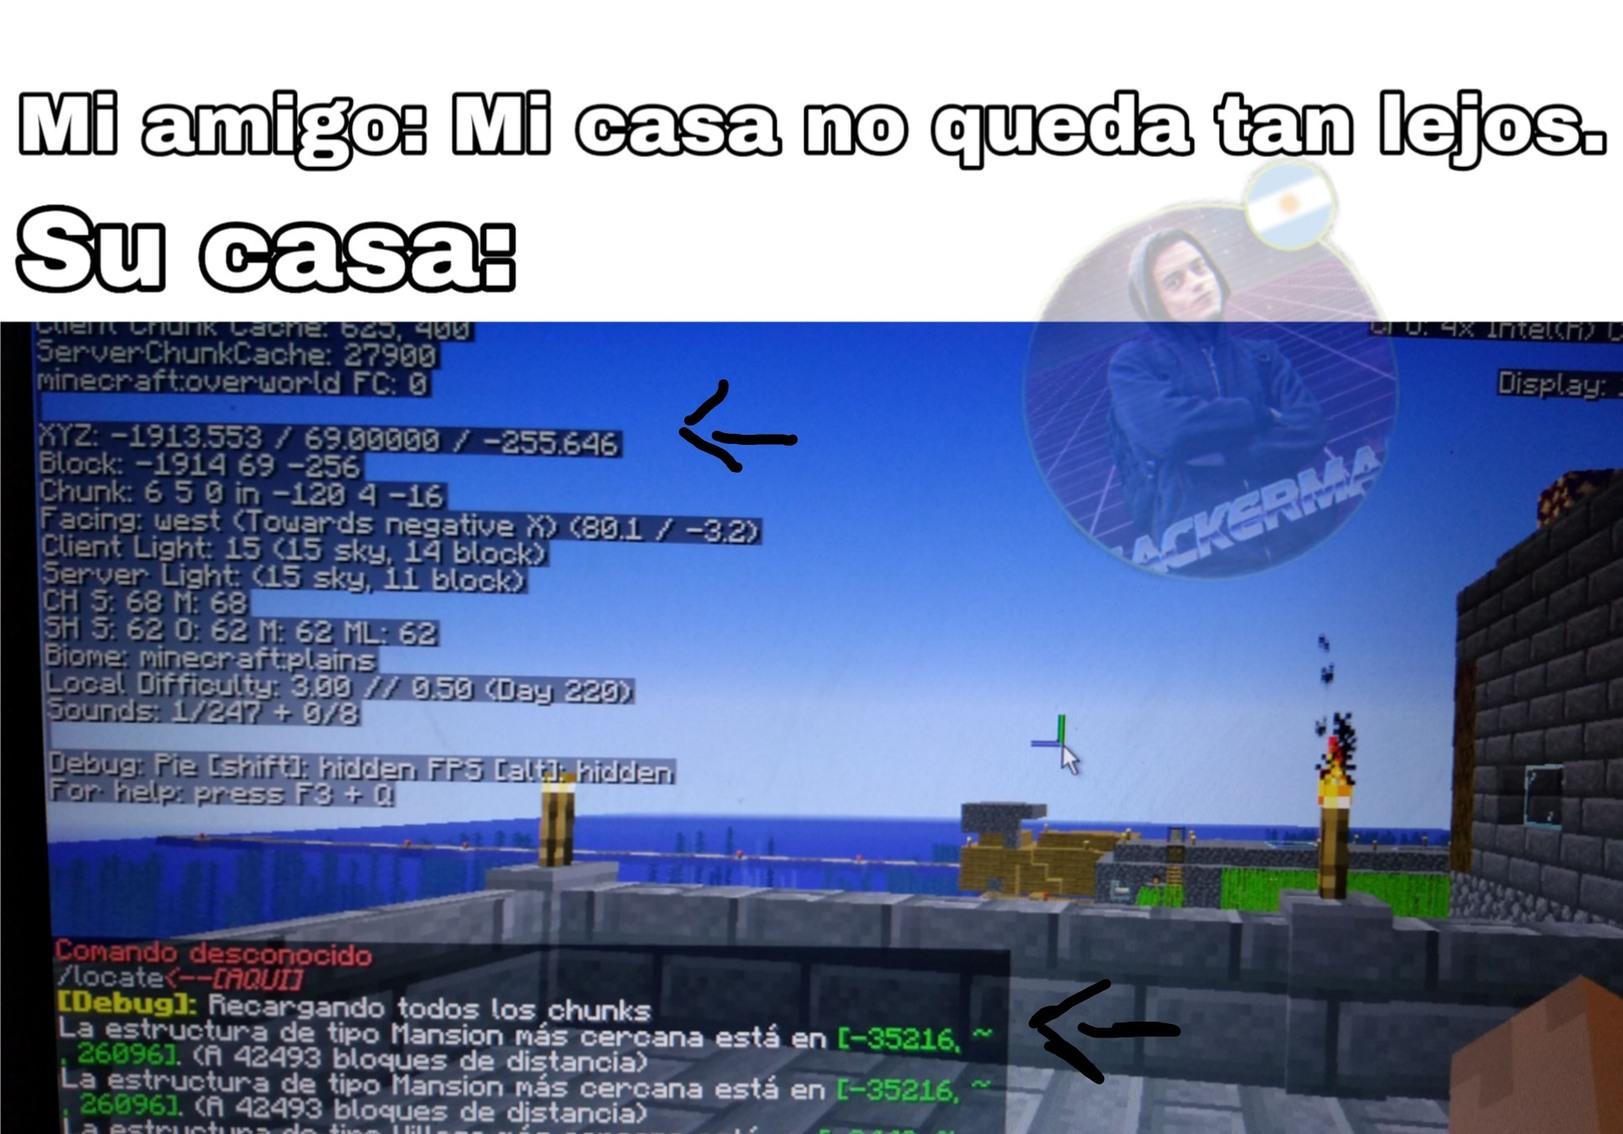 FLACO QUE POSIBILIDADES HAY? - meme